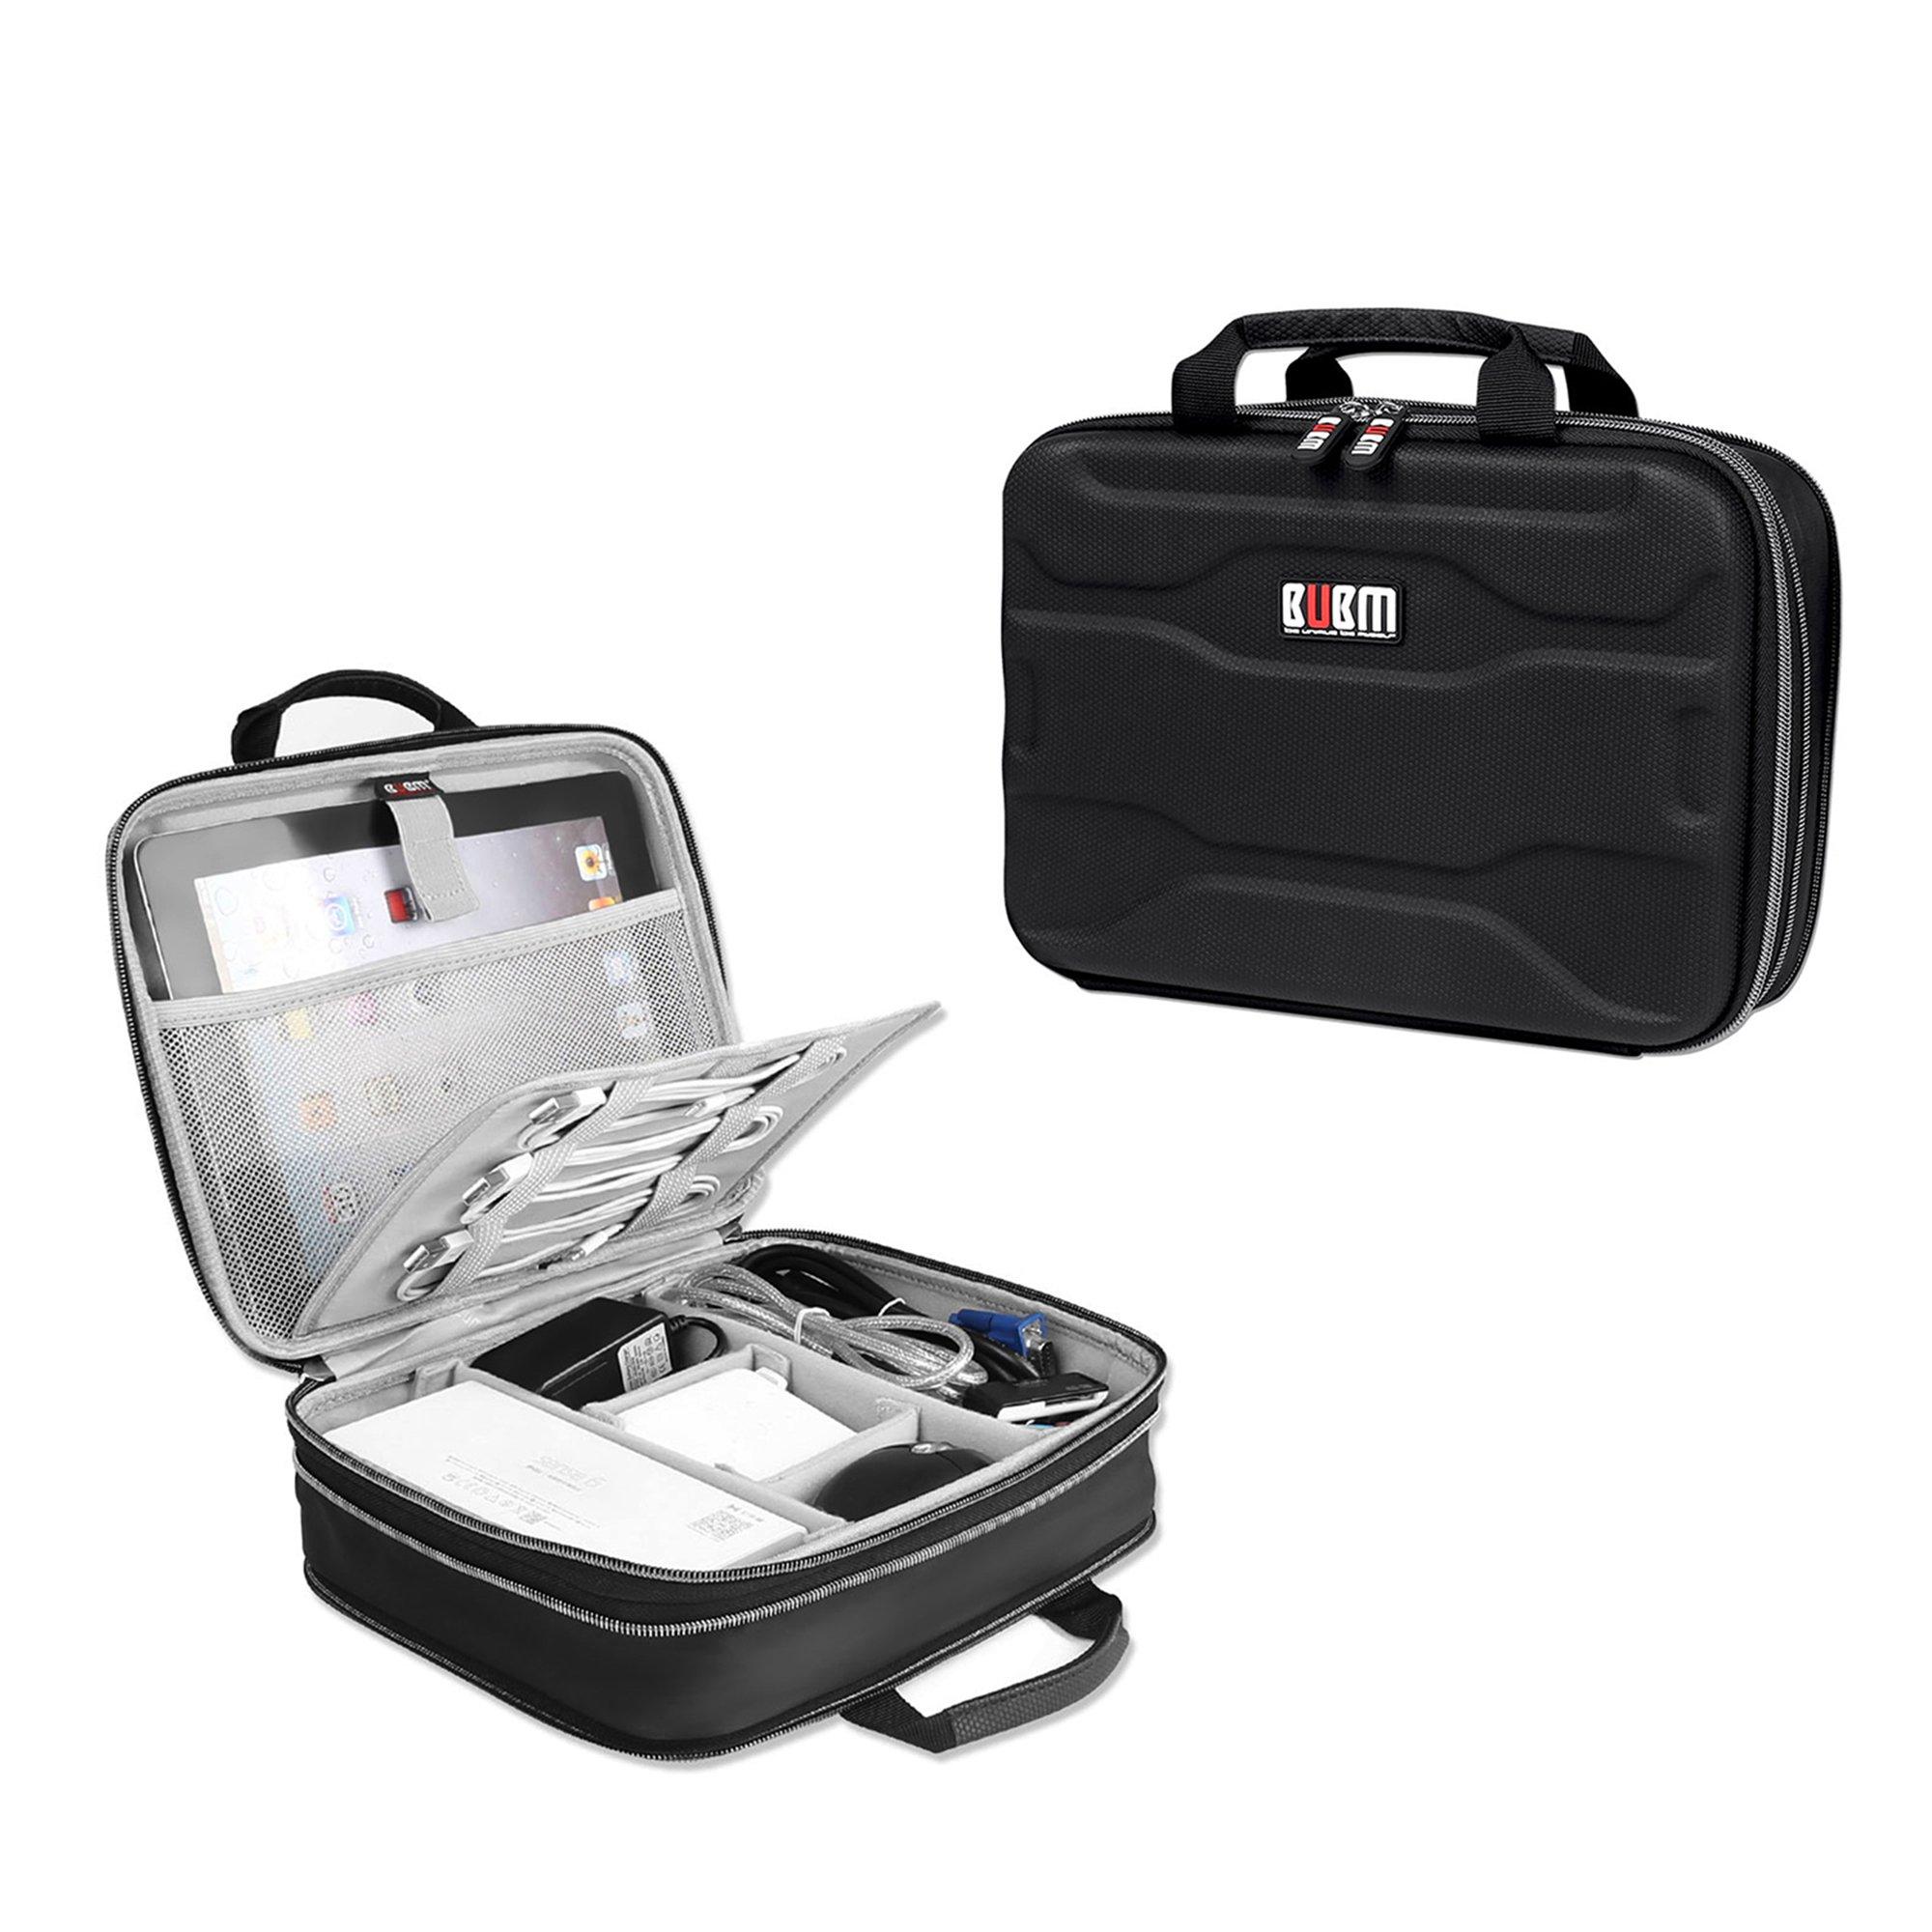 Travel Bag Organizer Electronics Organizer - BUBM Cable Organizer Storage Bag for iPad Mini,Power Bank,USB Cable,Flash,Hard Drive, Portable Hard Shell Travel Gadget Bag,2 Year Warranty(S)